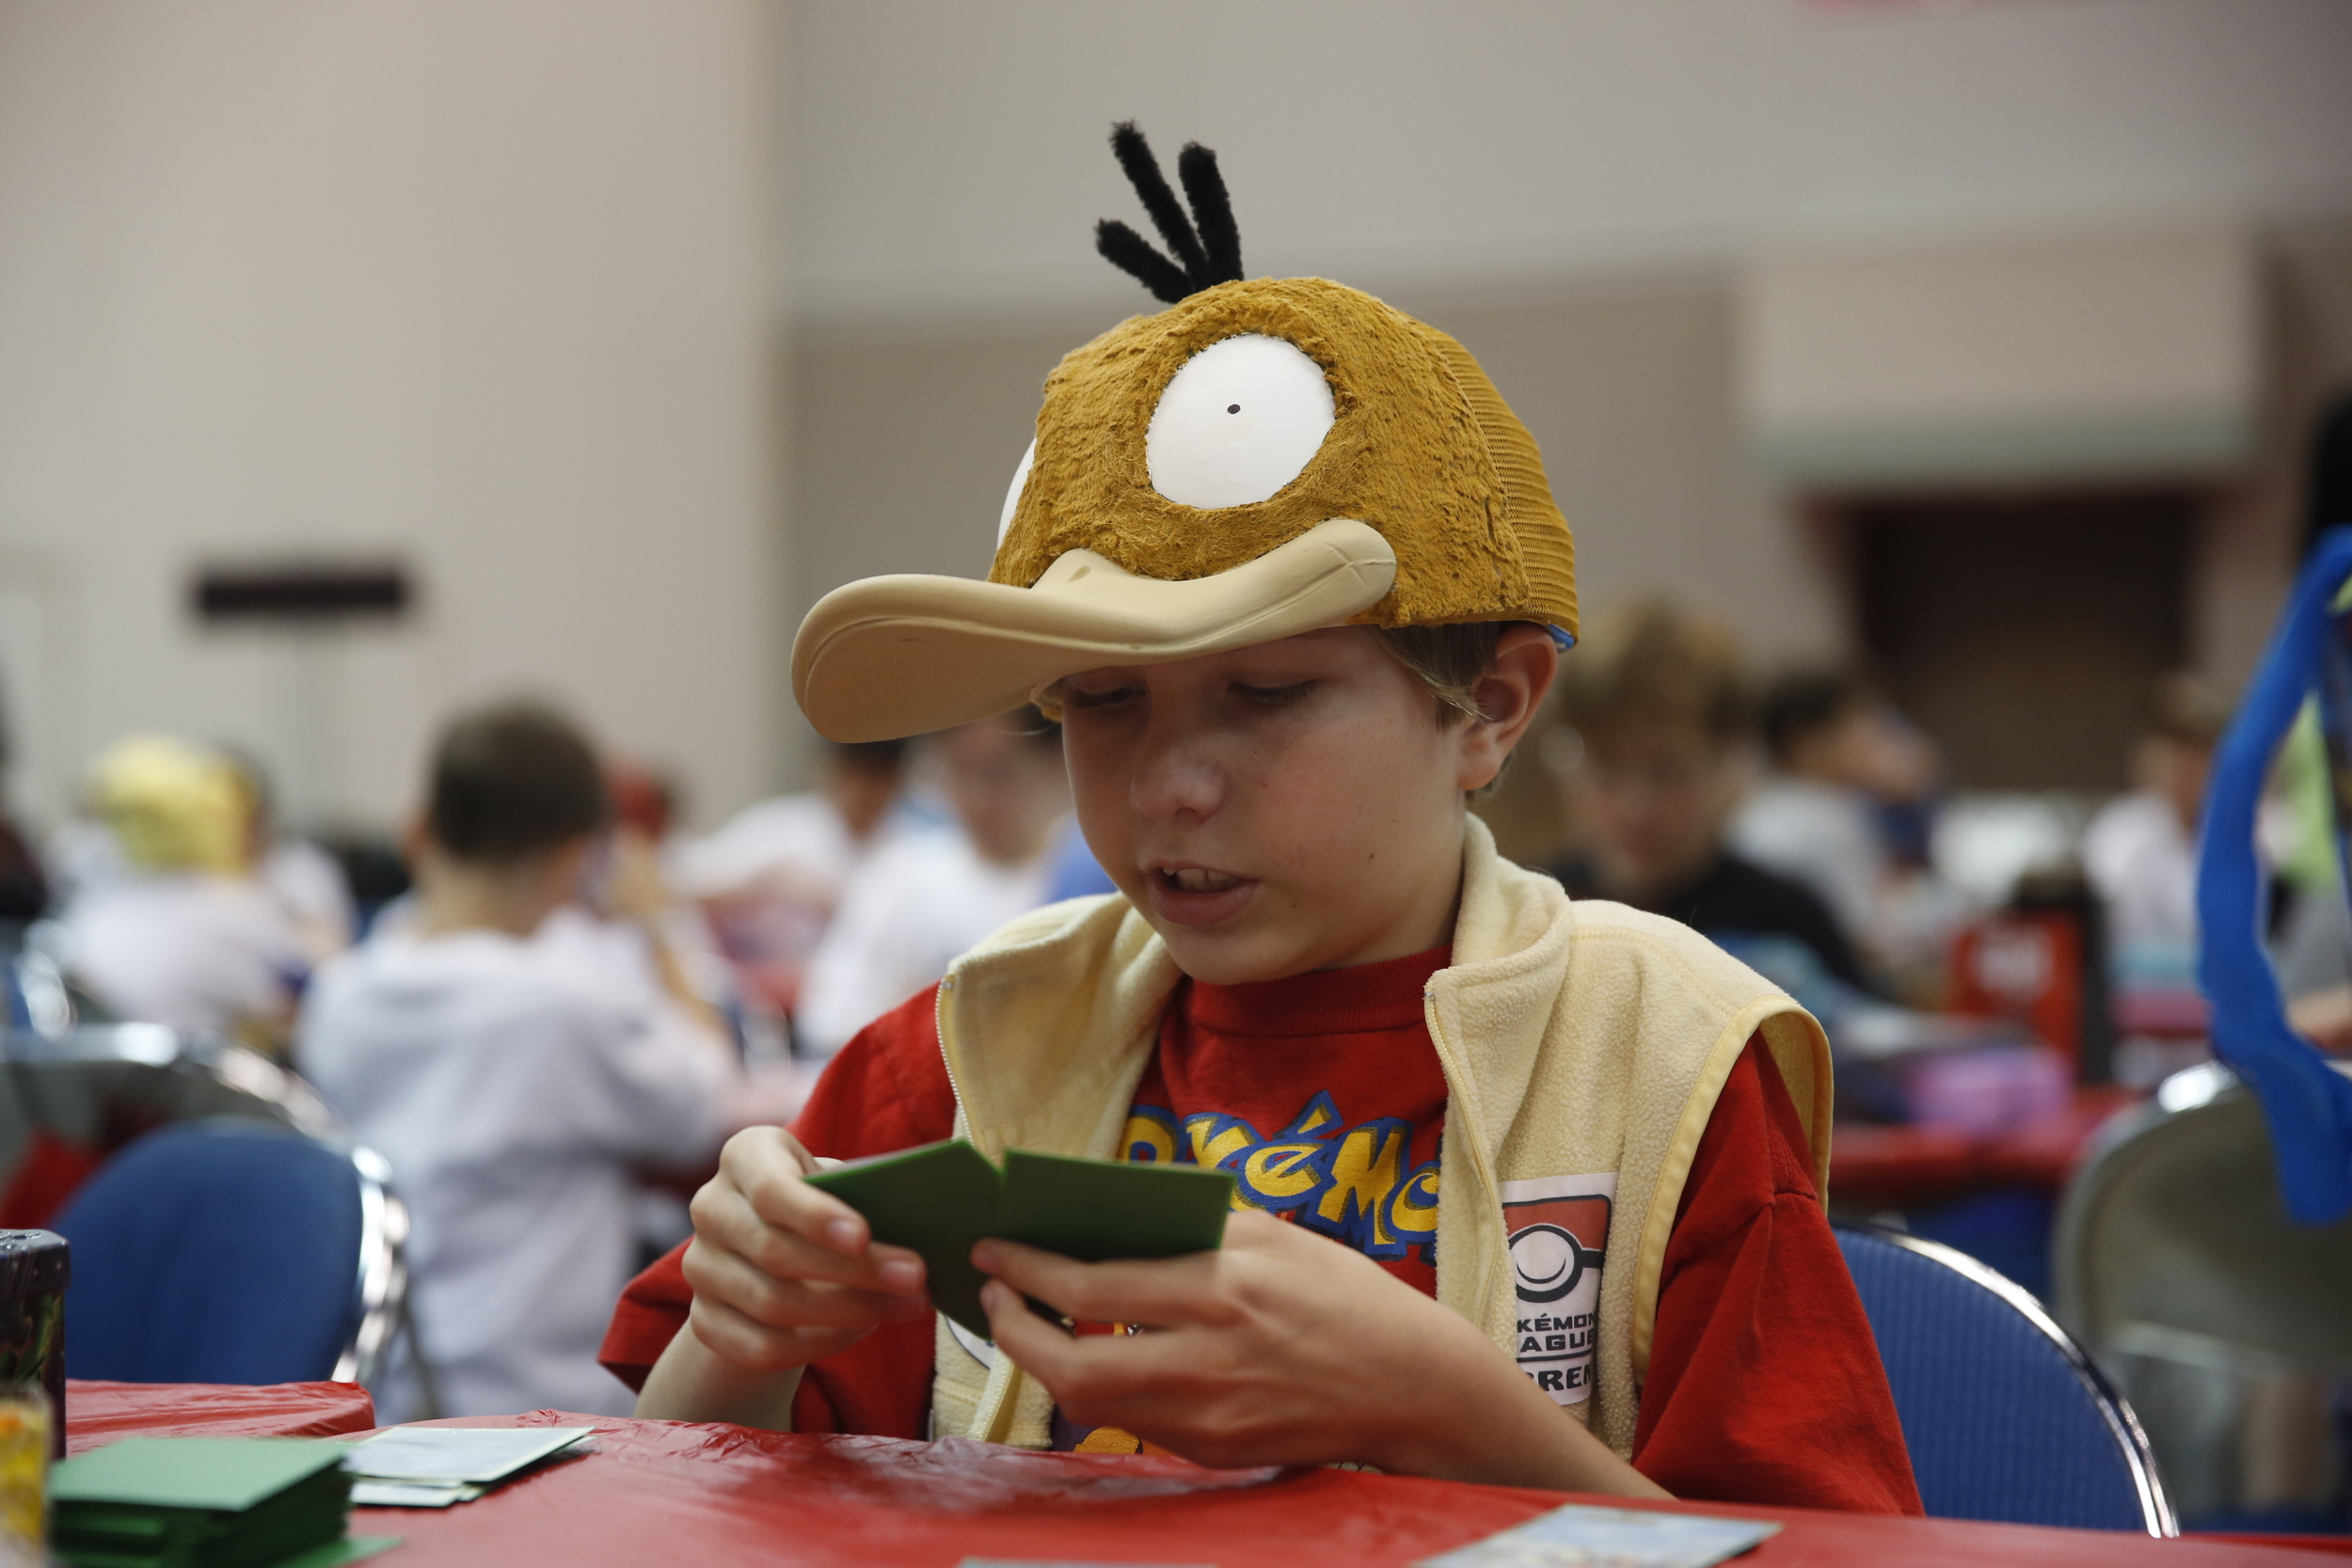 2013 U.S. Pokémon National Championships Image 4.JPG